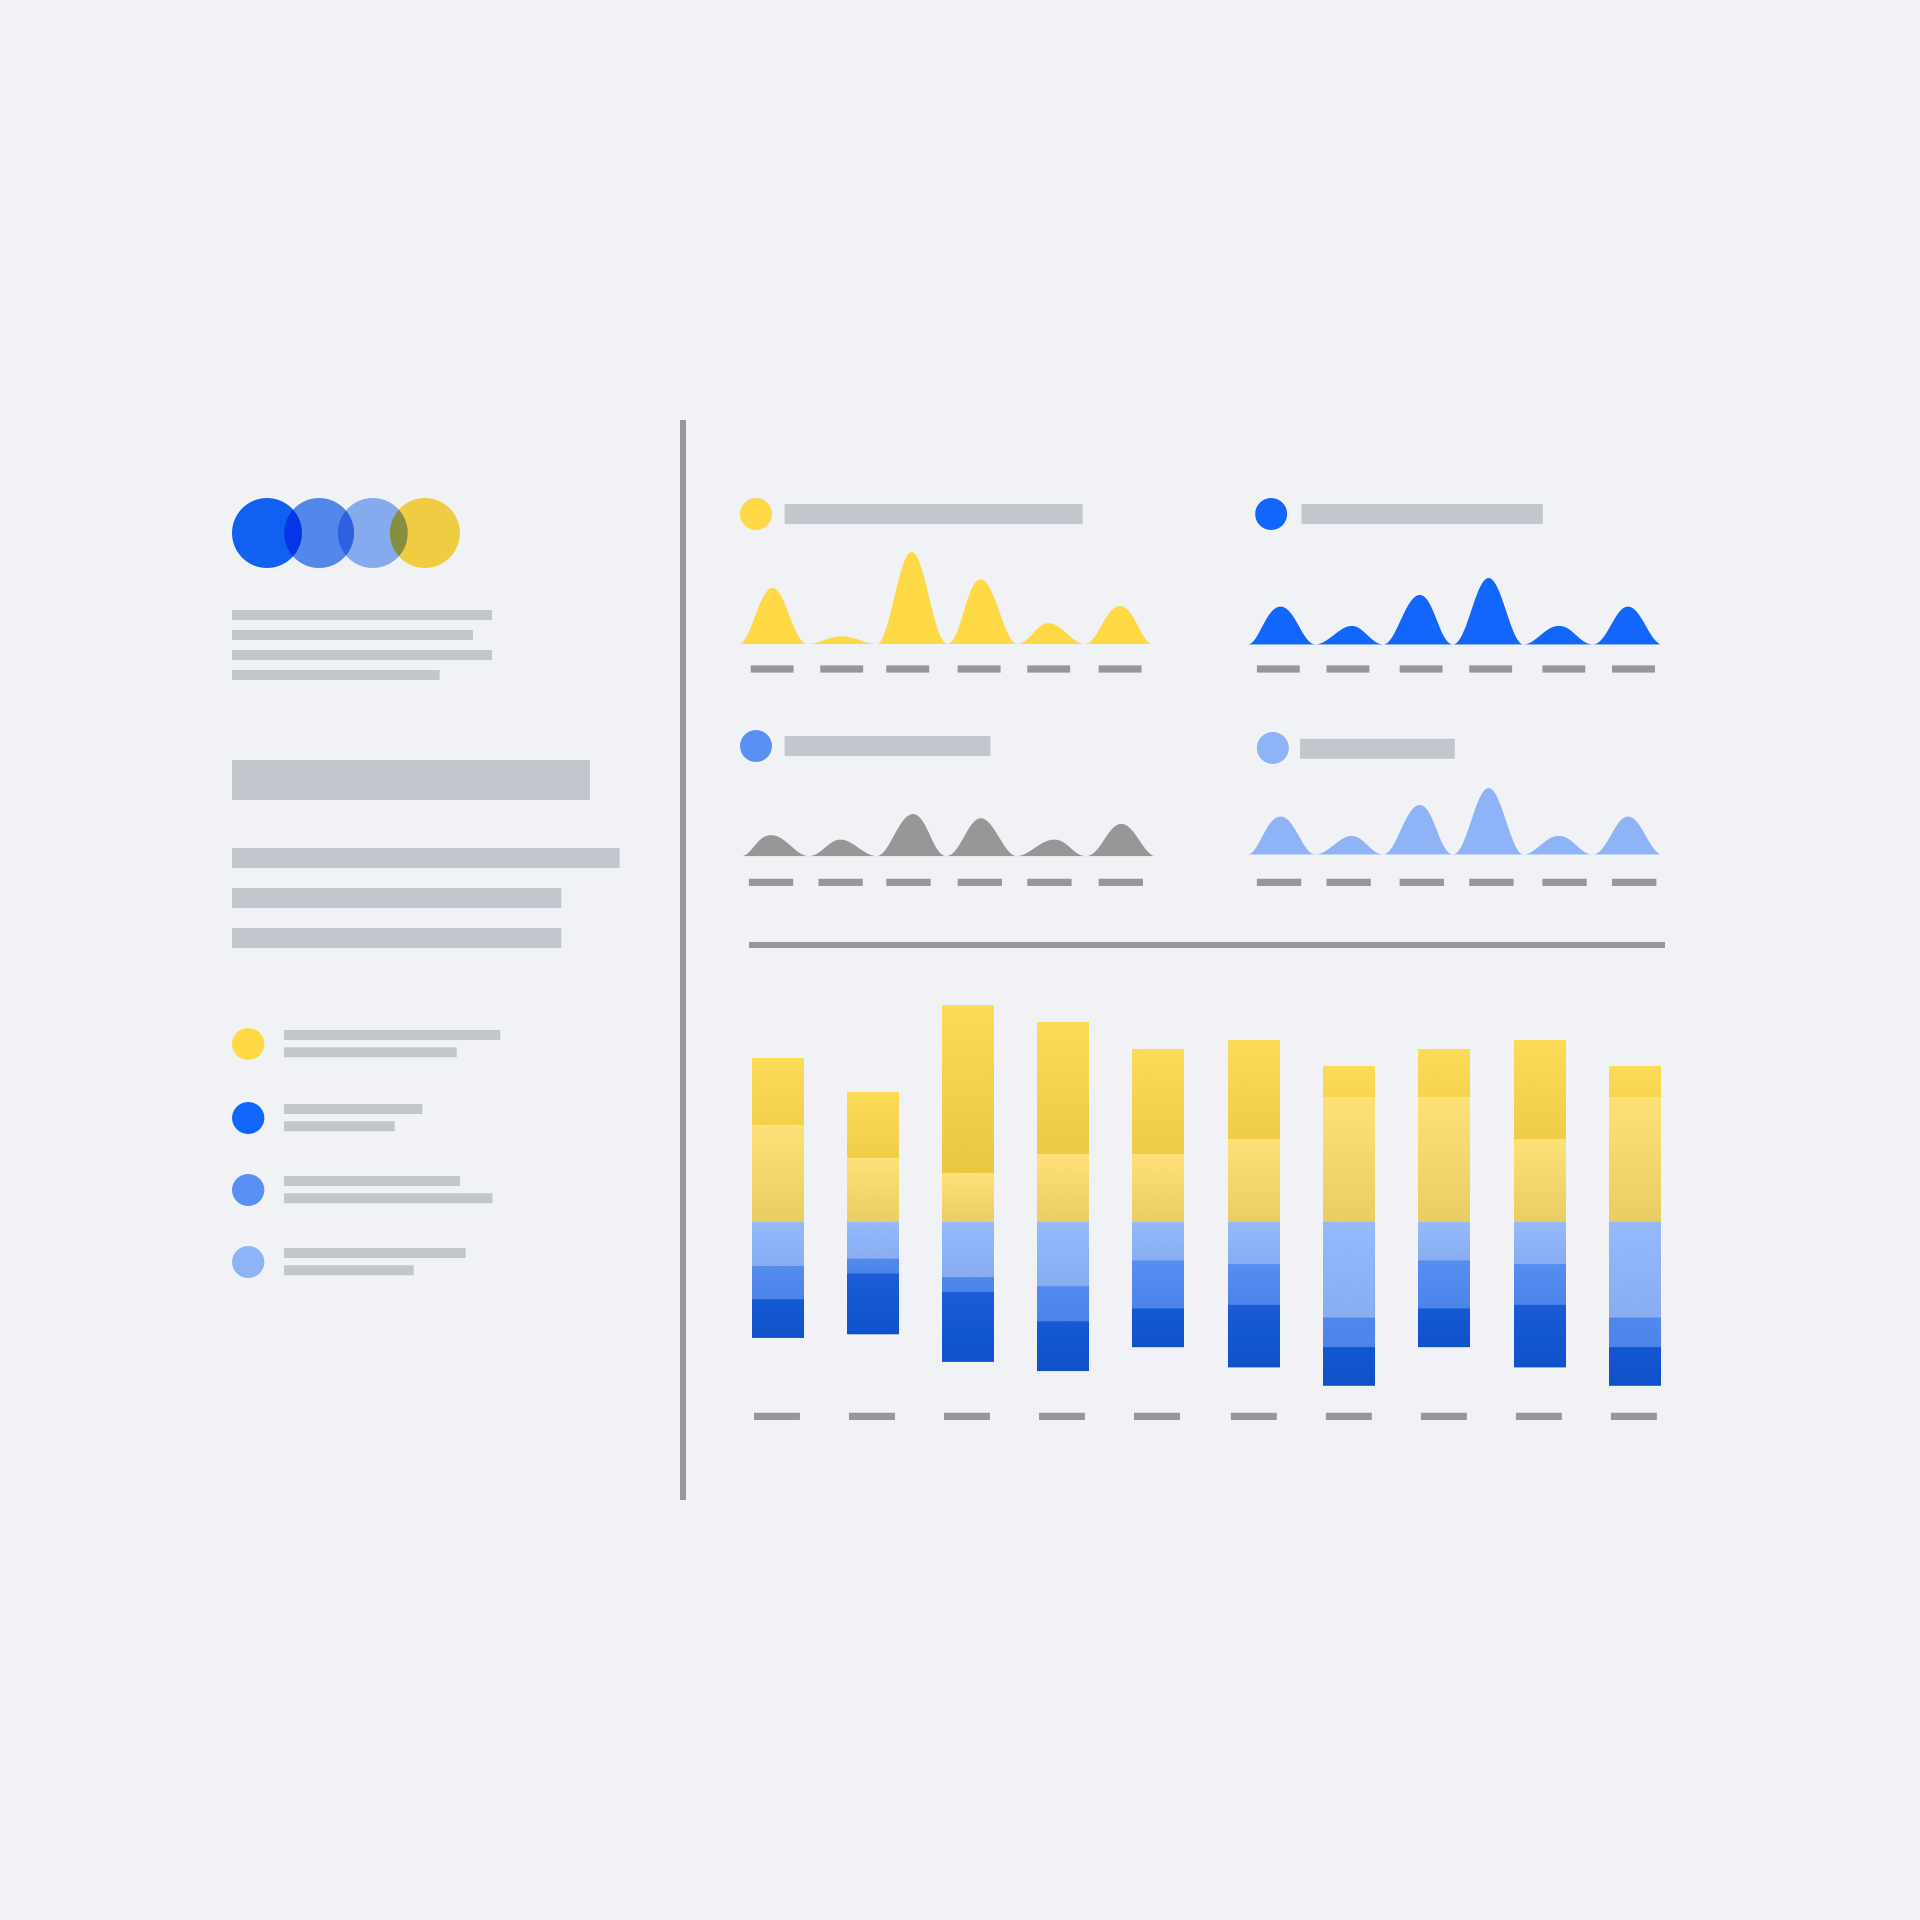 An example data dashboard